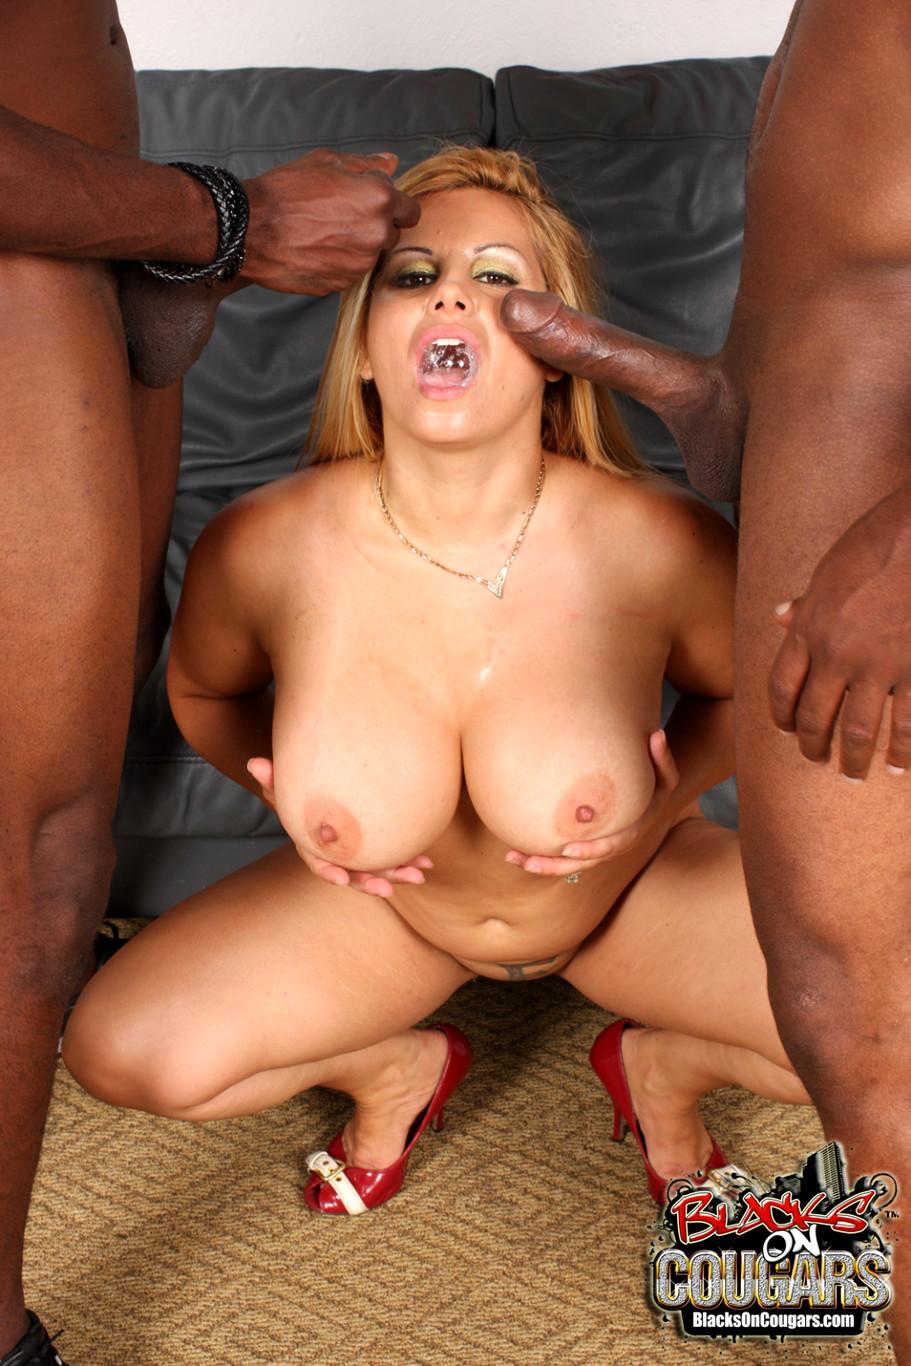 Ladyleea Interracial Orgy- Milf Cougar Mommy